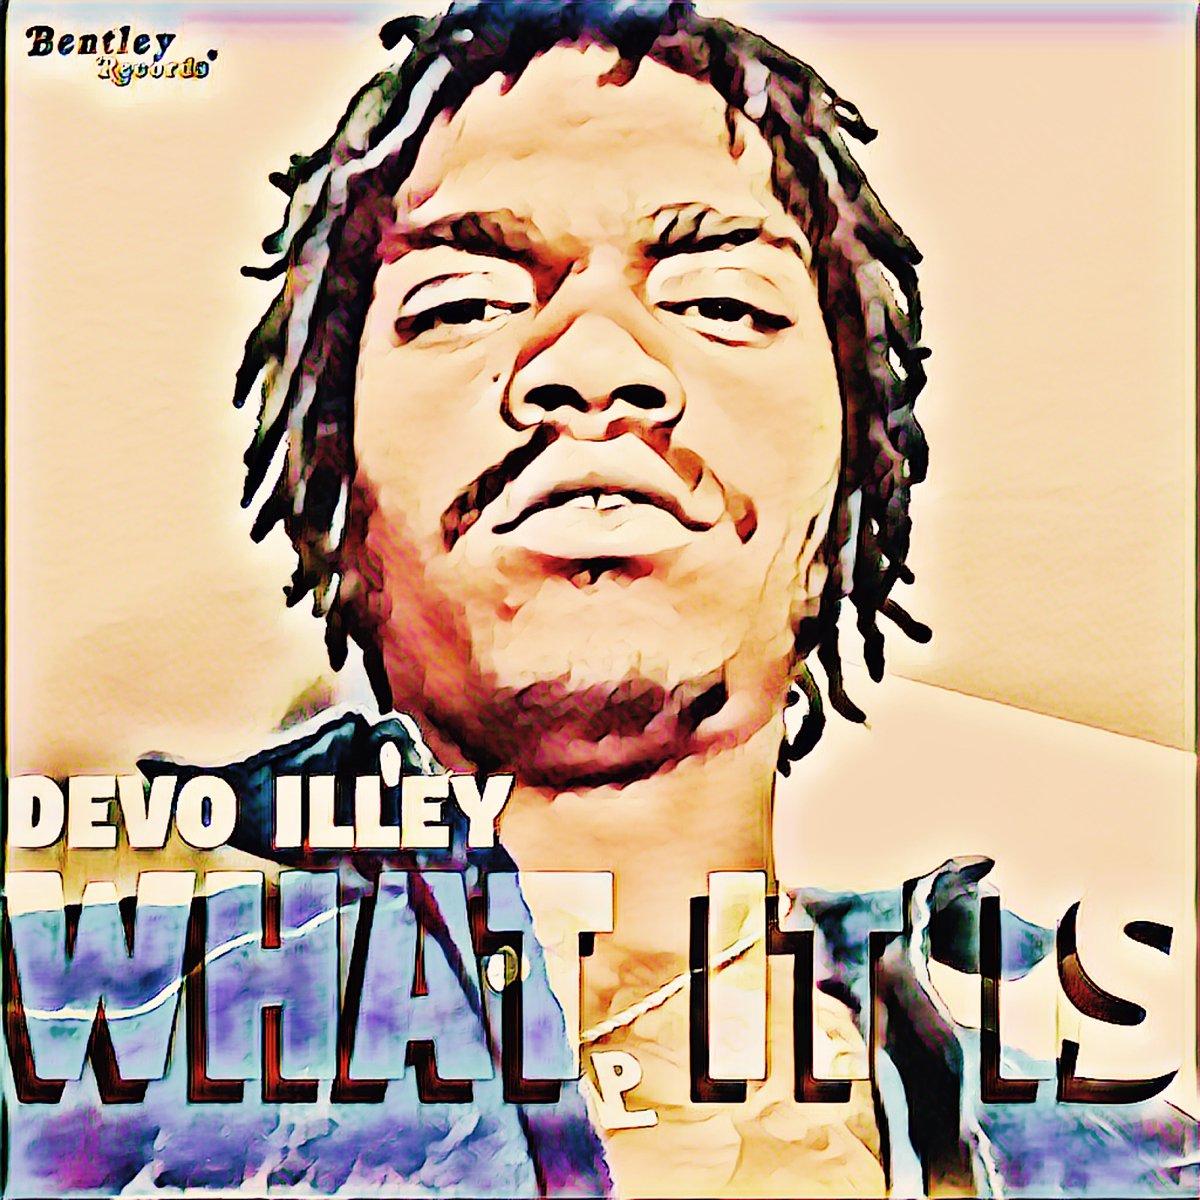 "New Music ""What It Is"" @yrndevoilley COMING OUT SOON  #BentleyRecords #BentleyRecordsRED #BentleyGang #NewMusic #Music #Release #RecordLabel #HipHop #Rap #Pop #Promo #Retweet #Repostpic.twitter.com/tr1T48gW5U"